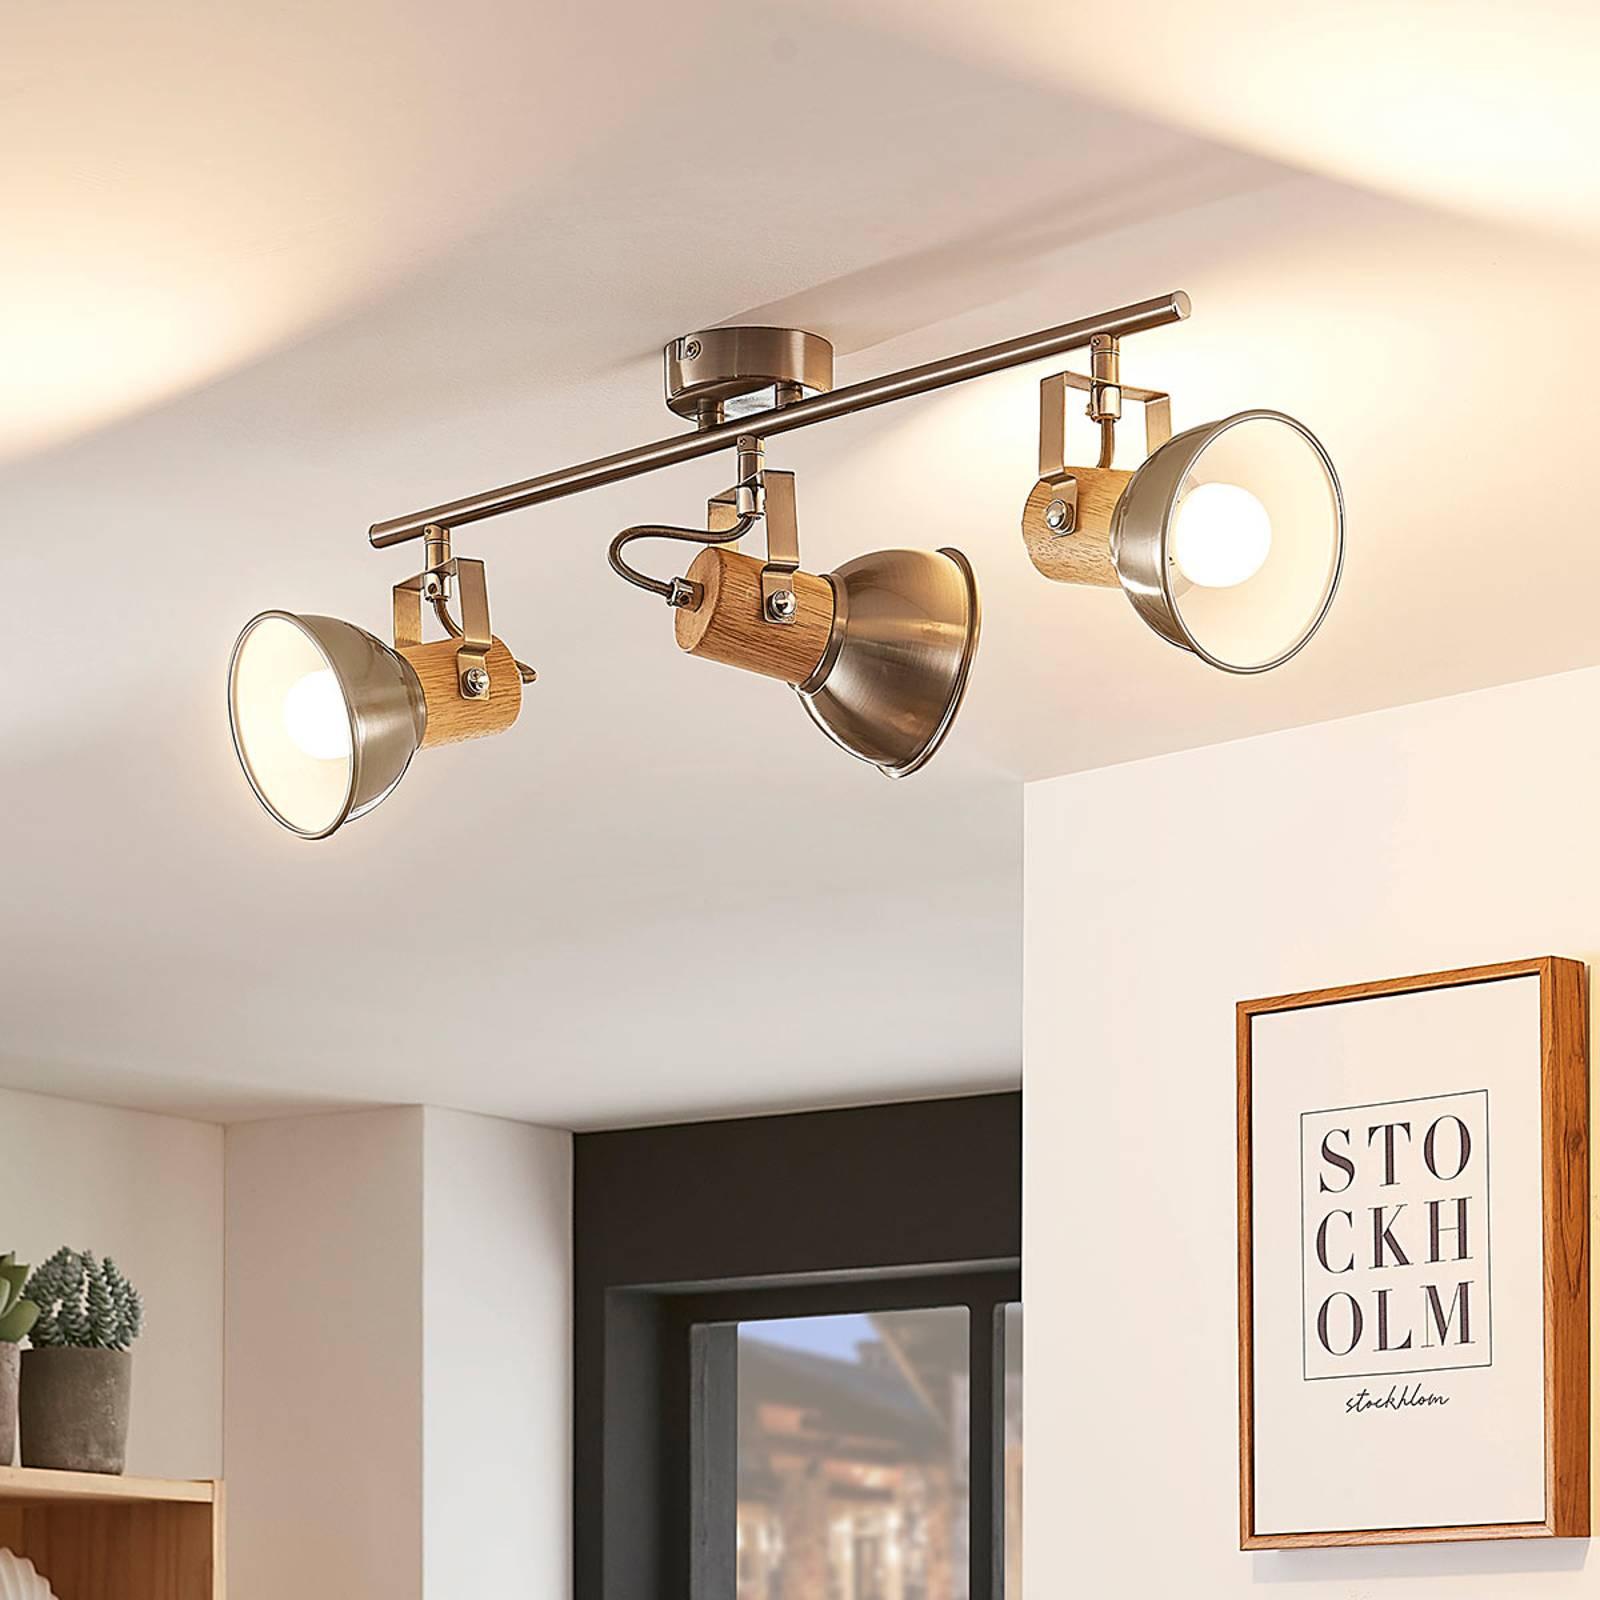 Dennis – 3-punktowa, podłużna lampa sufitowa LED